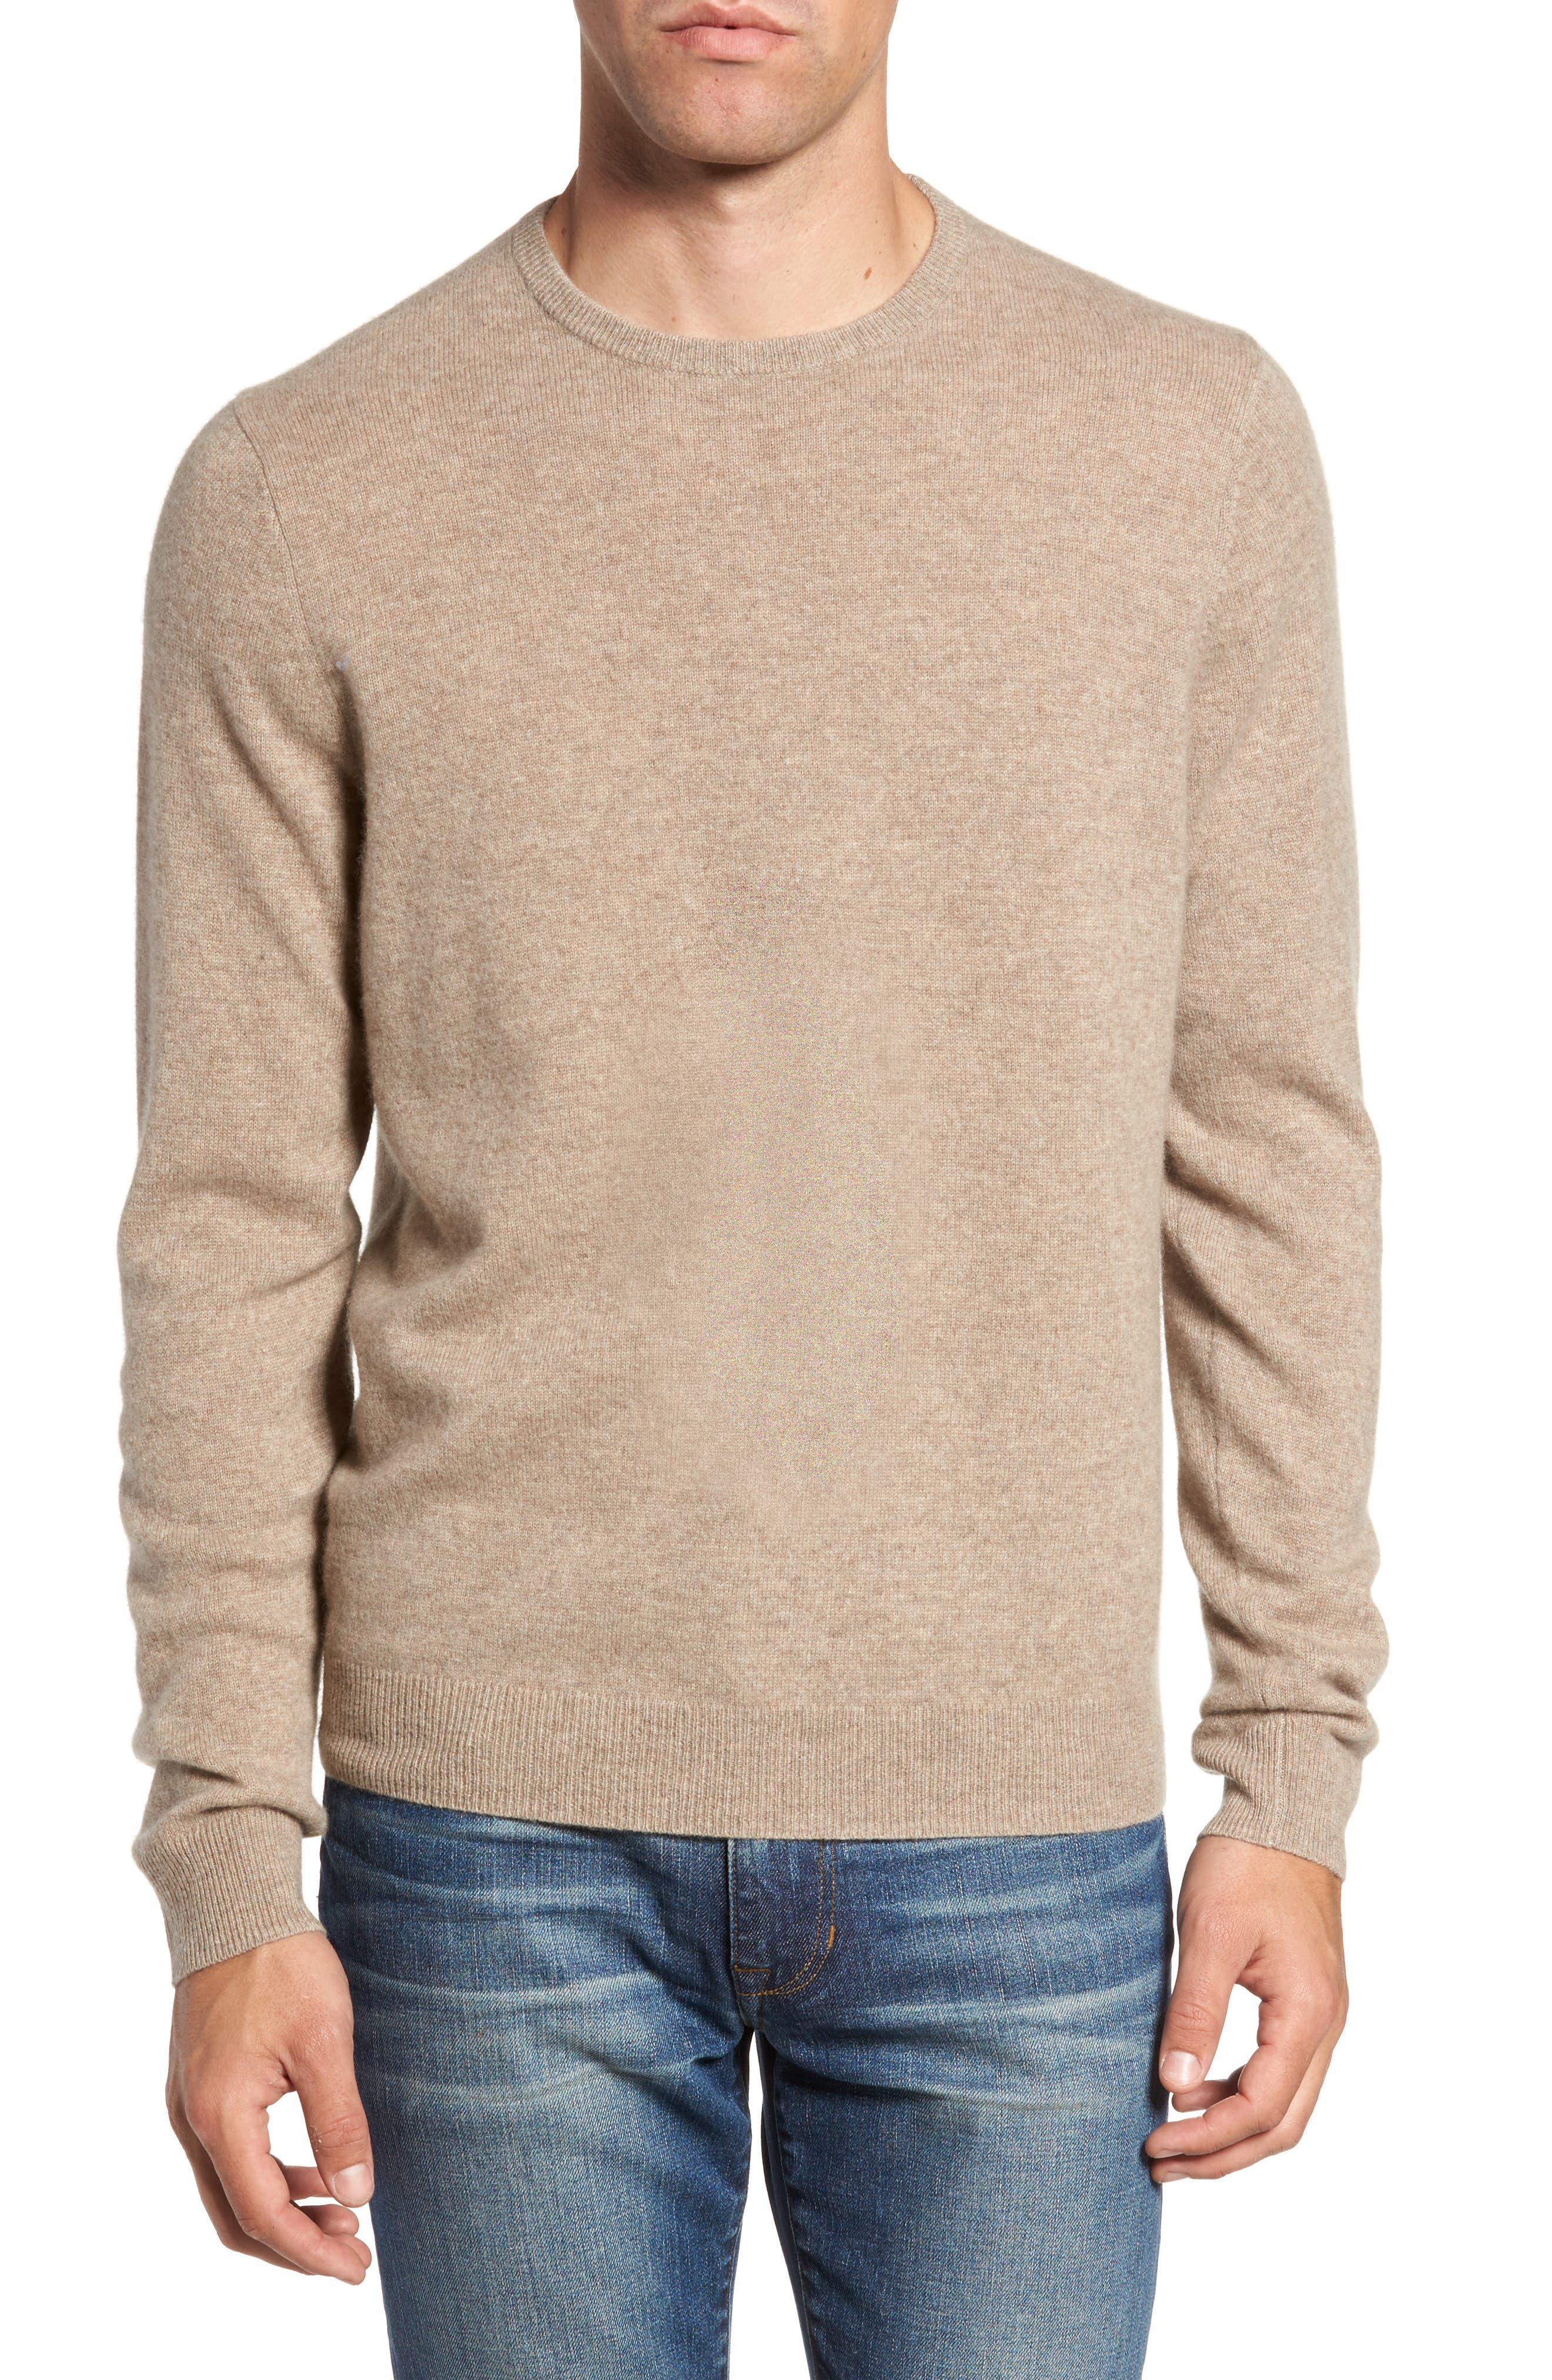 Nordstrom Shop Cashmere Crewneck Sweater, Brown